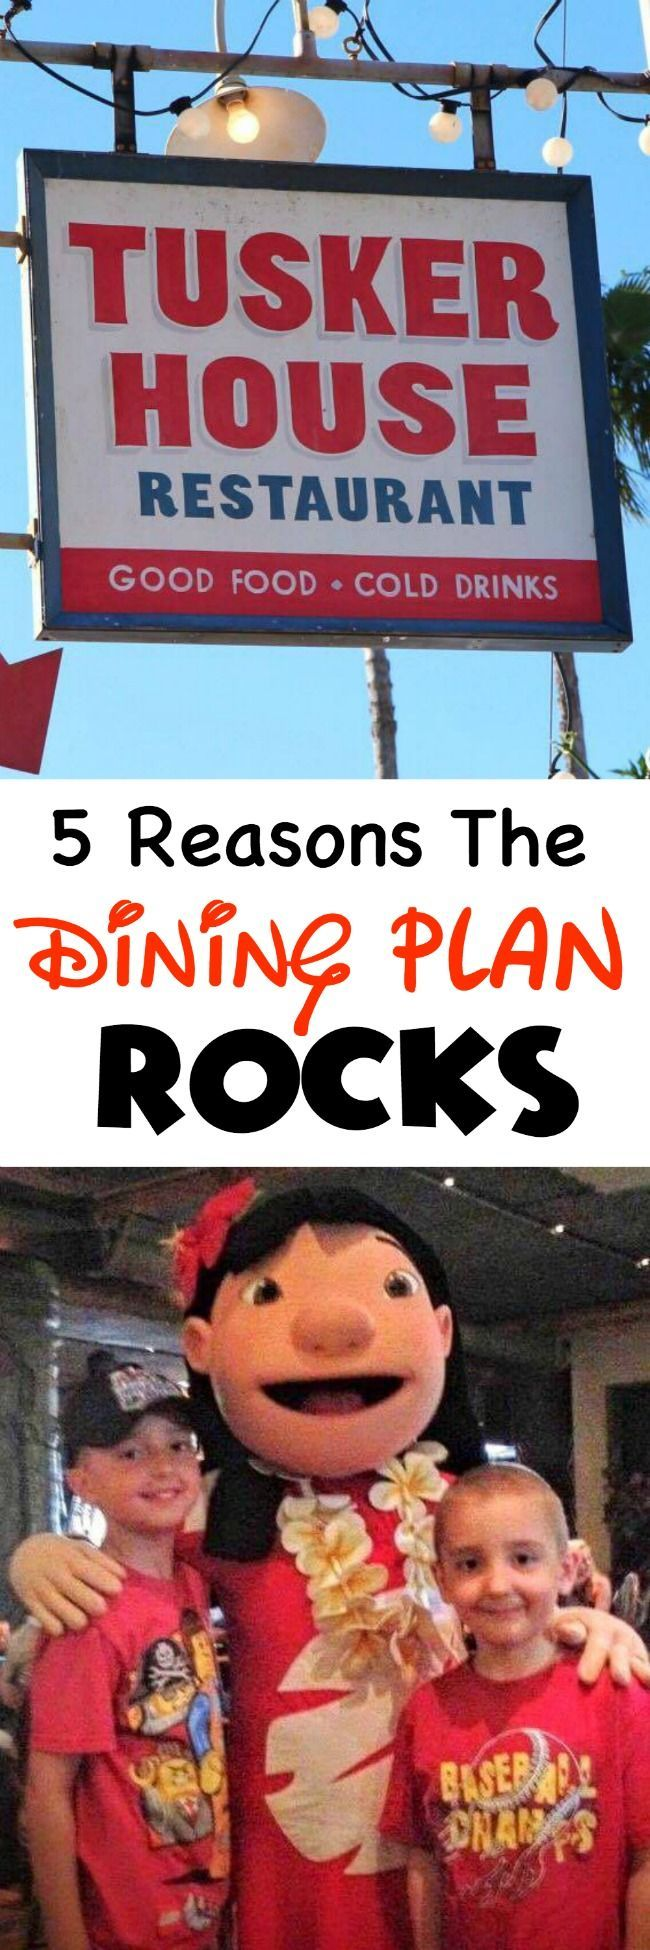 Five reasons the Disney Dining Plan Rocks! disney dining plan, Disneyland Dining Plan magic kingdom, Disneyland Dining Plan tips, Disneyland Dining Plan disney snacks